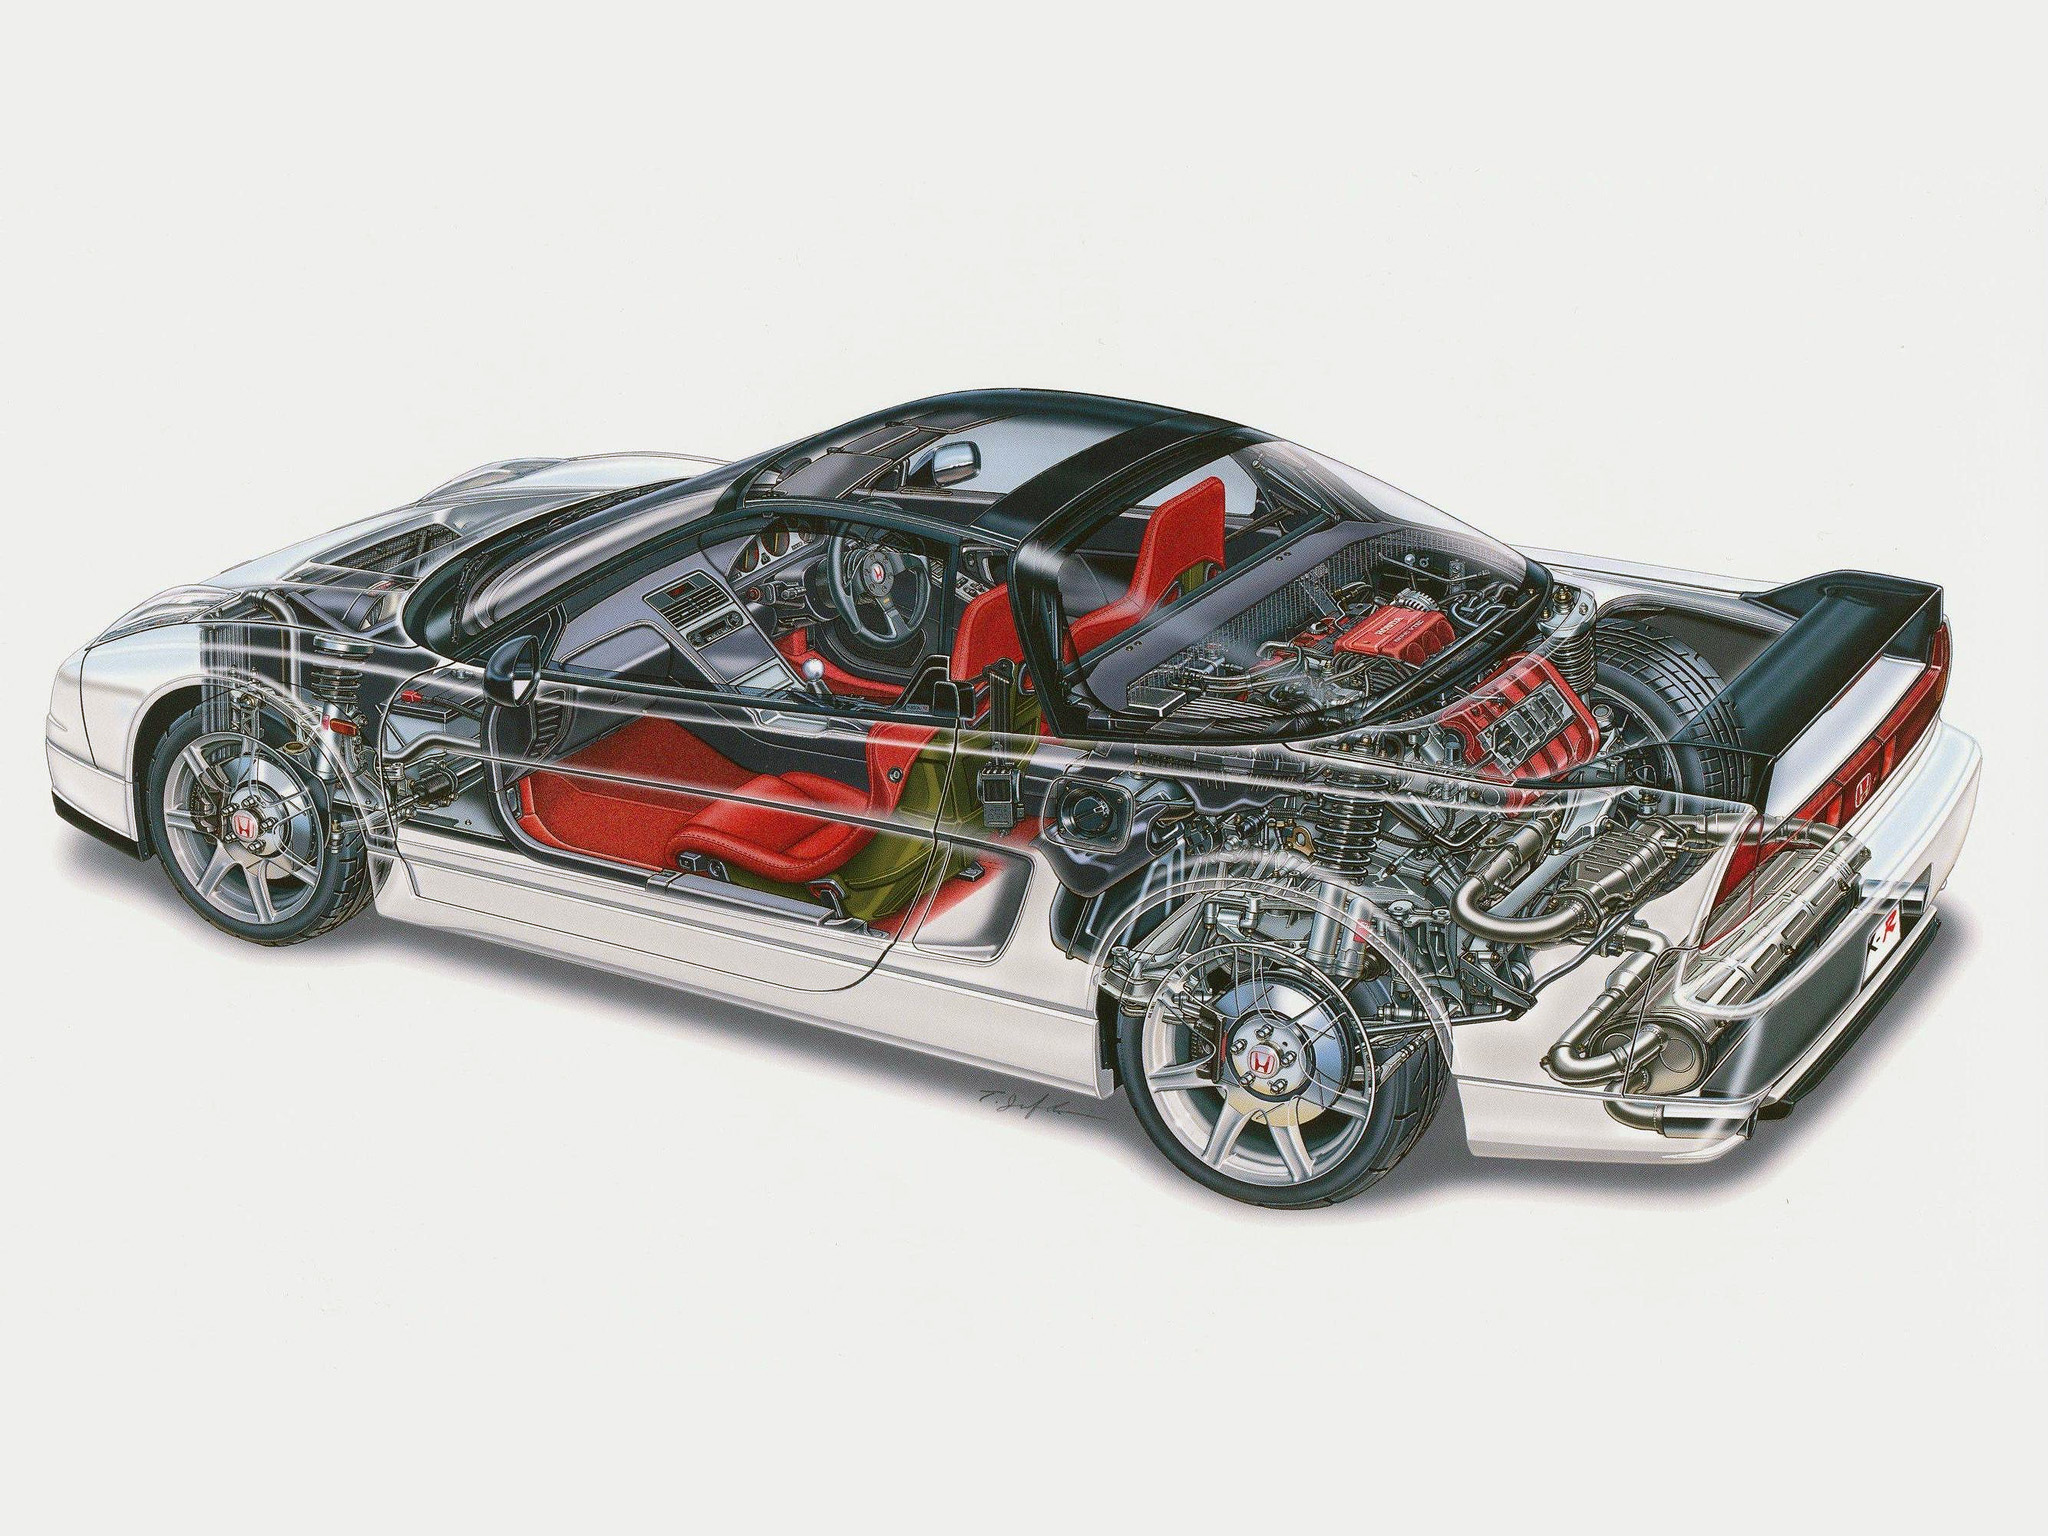 Honda Nsx Engine - Viewing Gallery